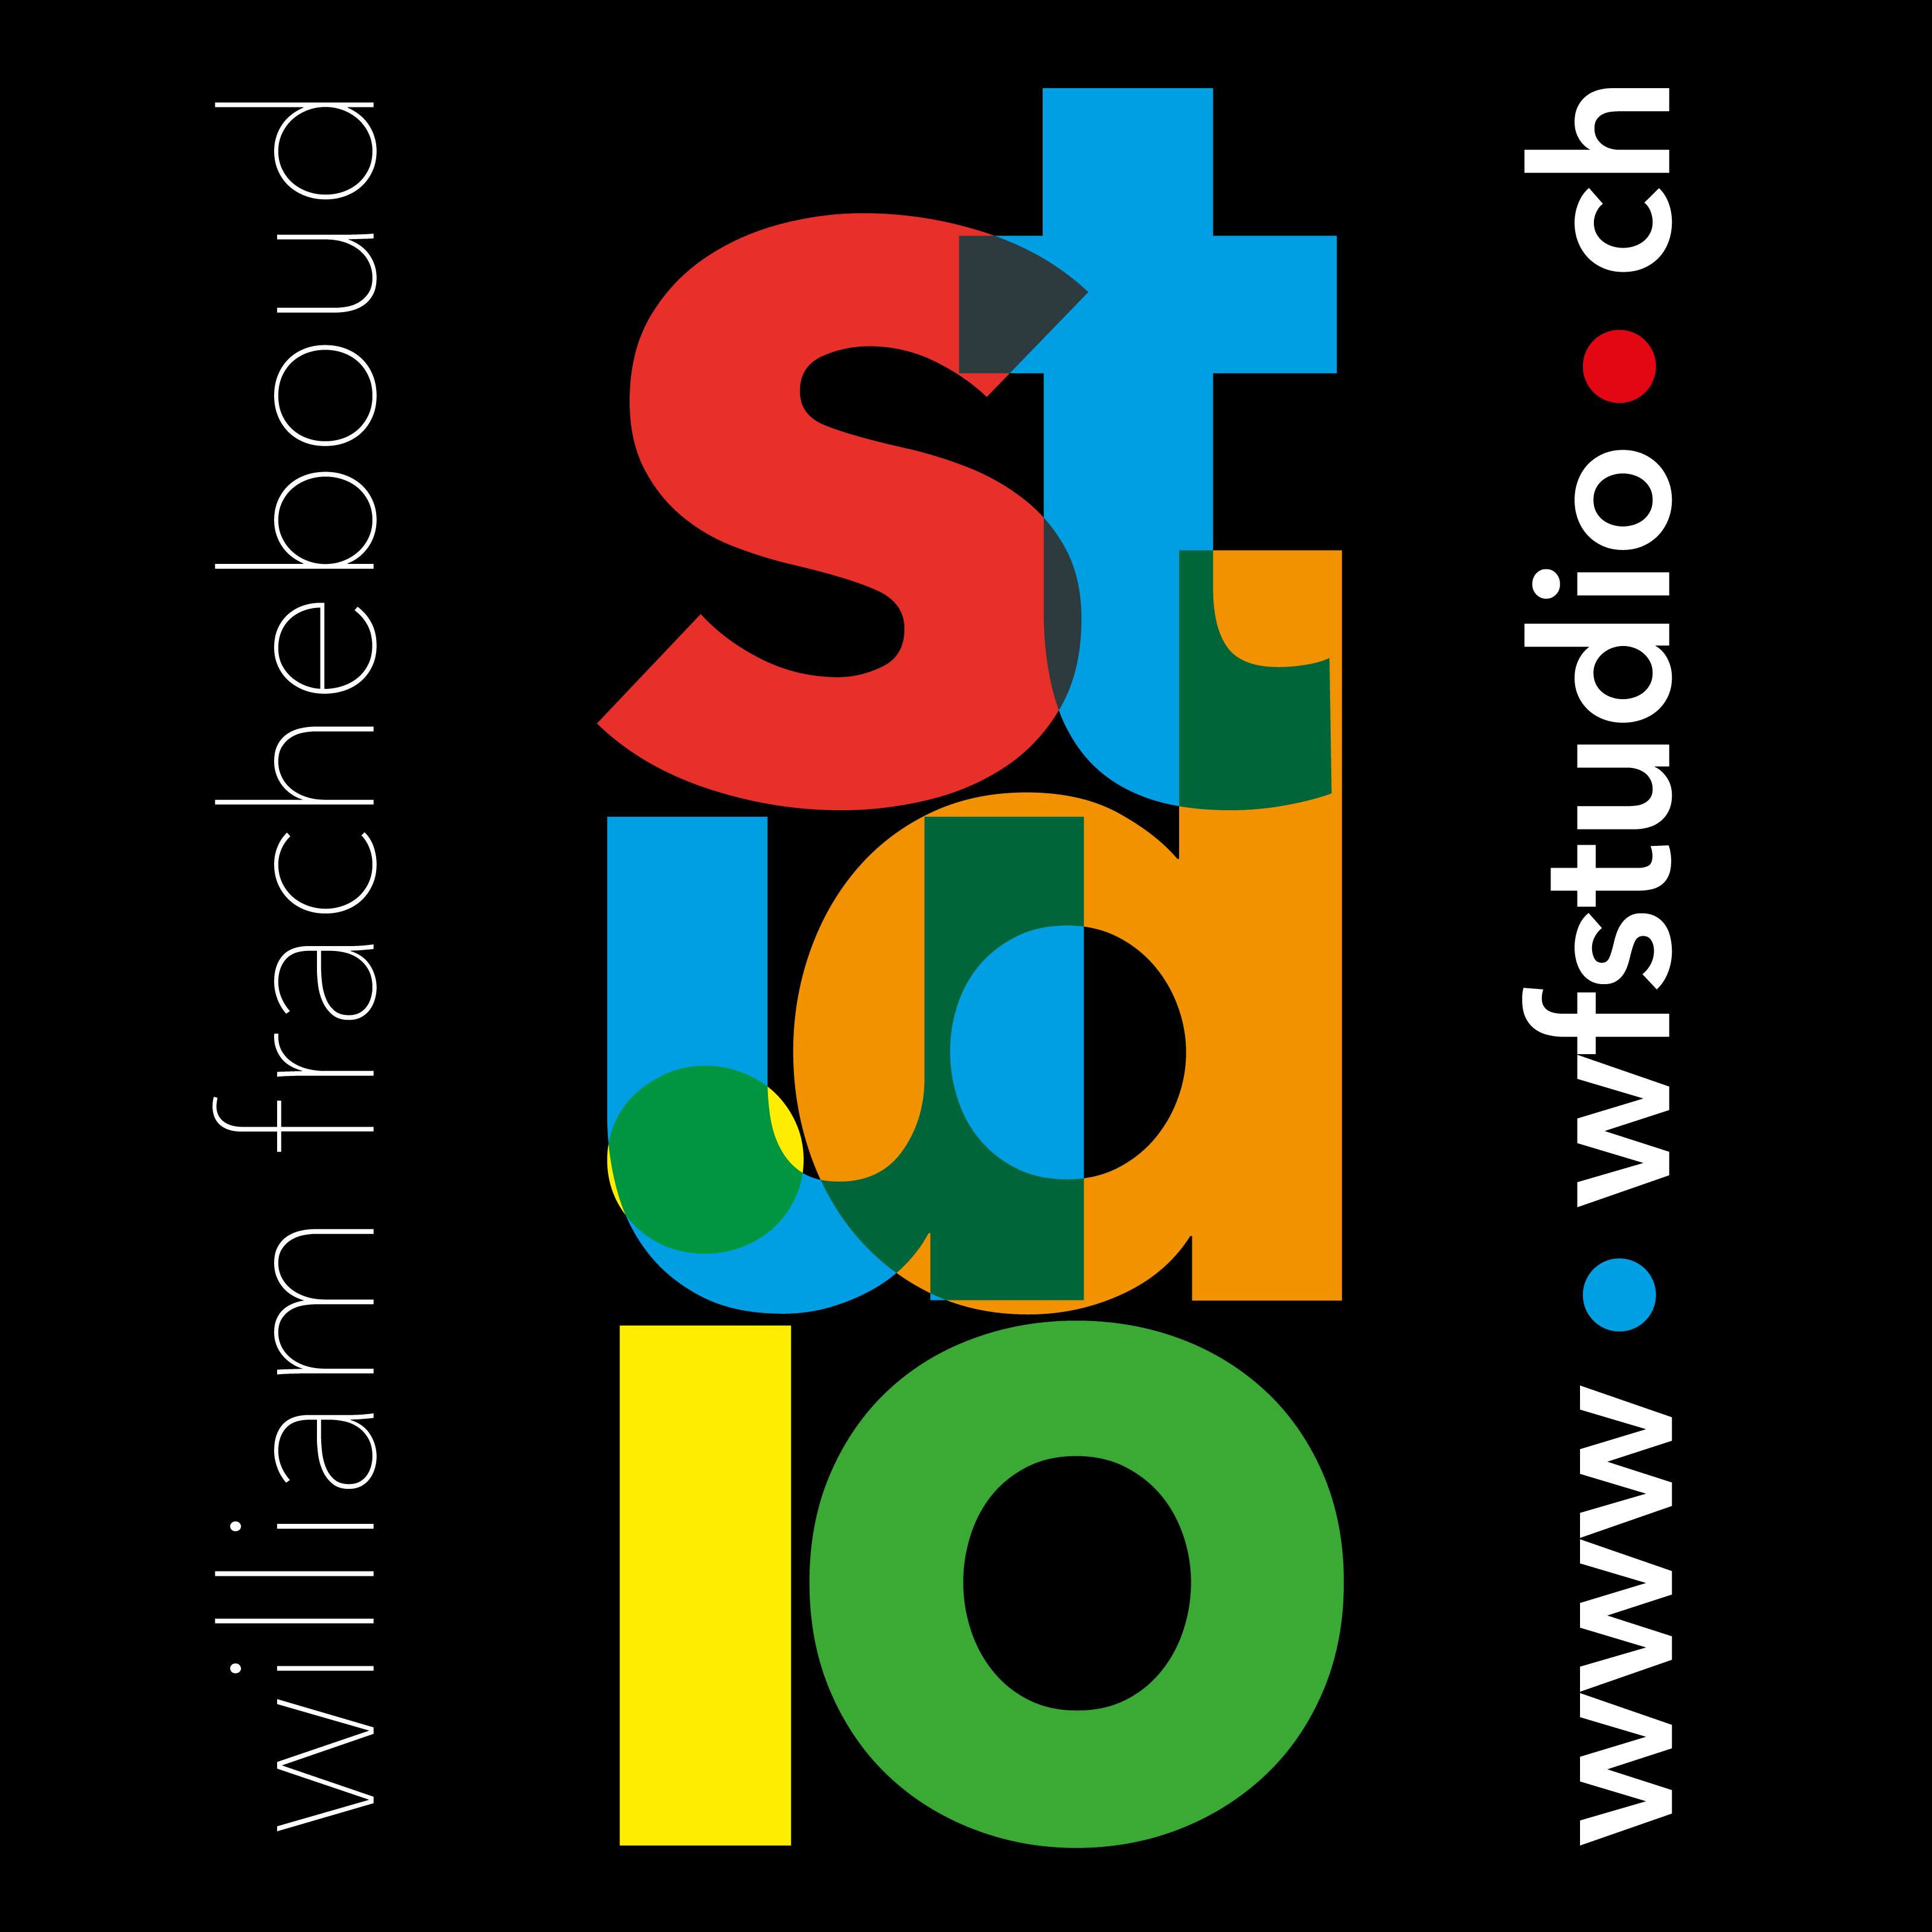 Logo-WFStudio-2018-blackBG.png